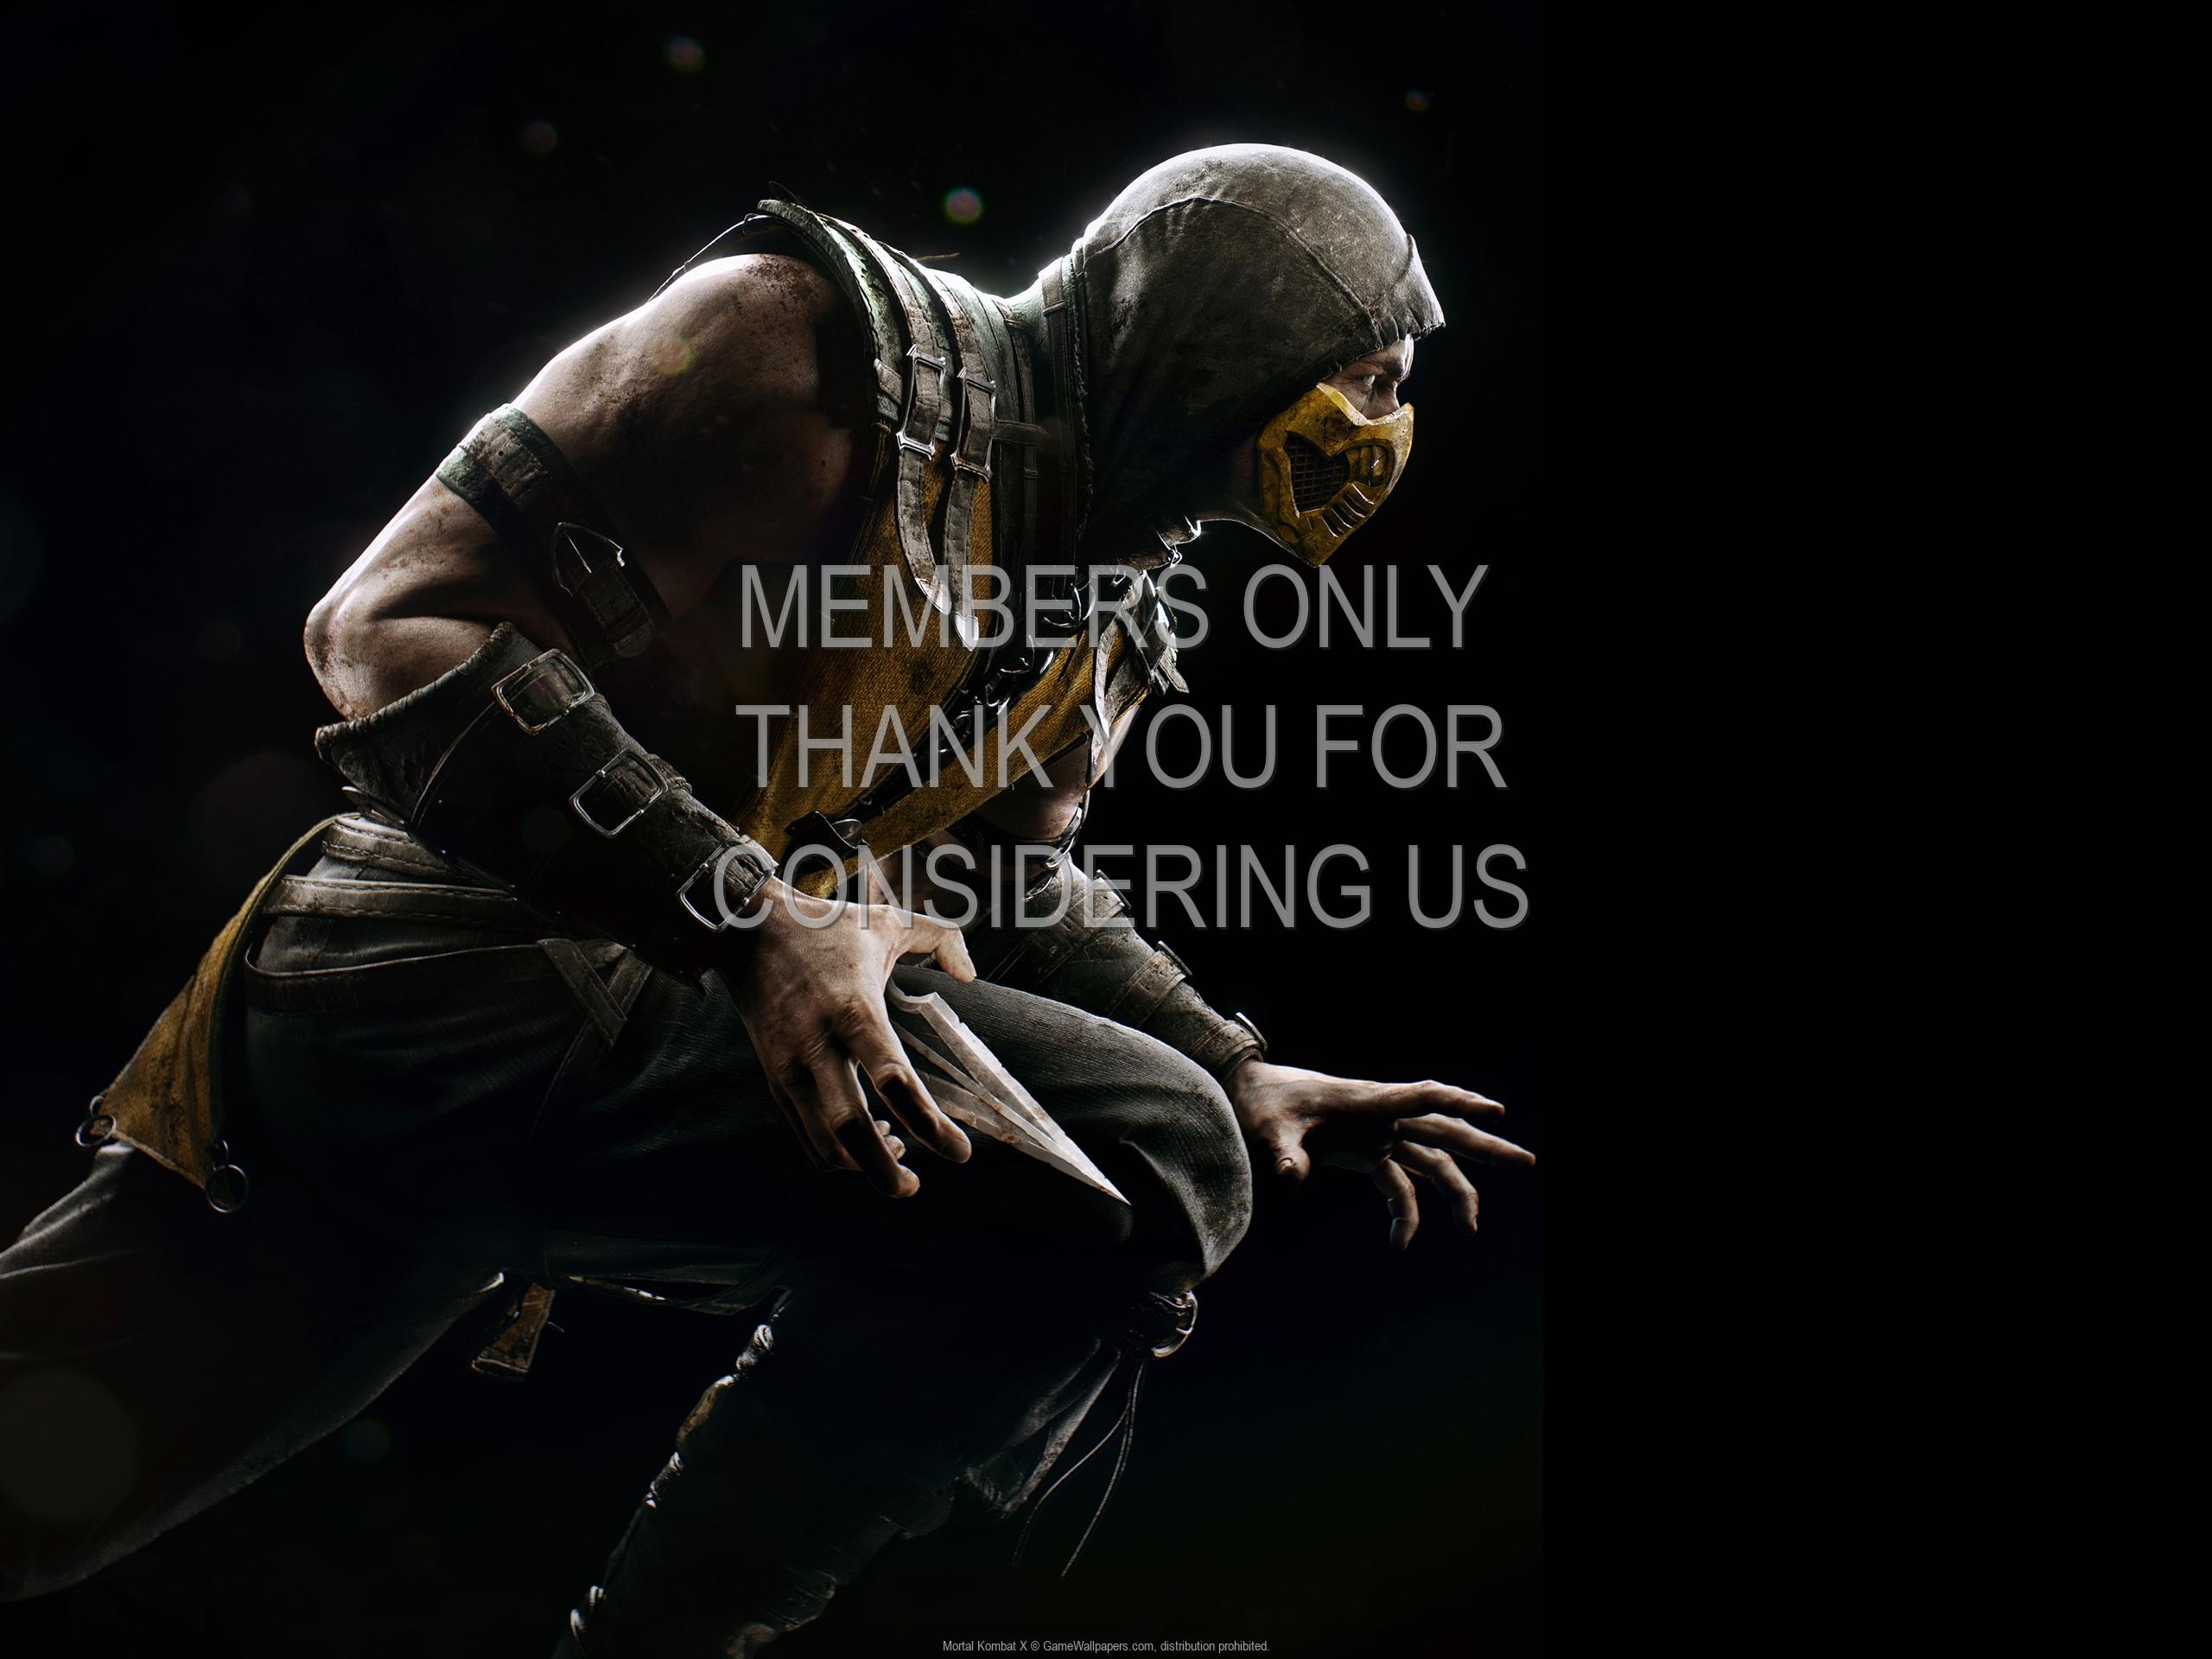 Mortal Kombat X 1920x1080 Handy Hintergrundbild 01